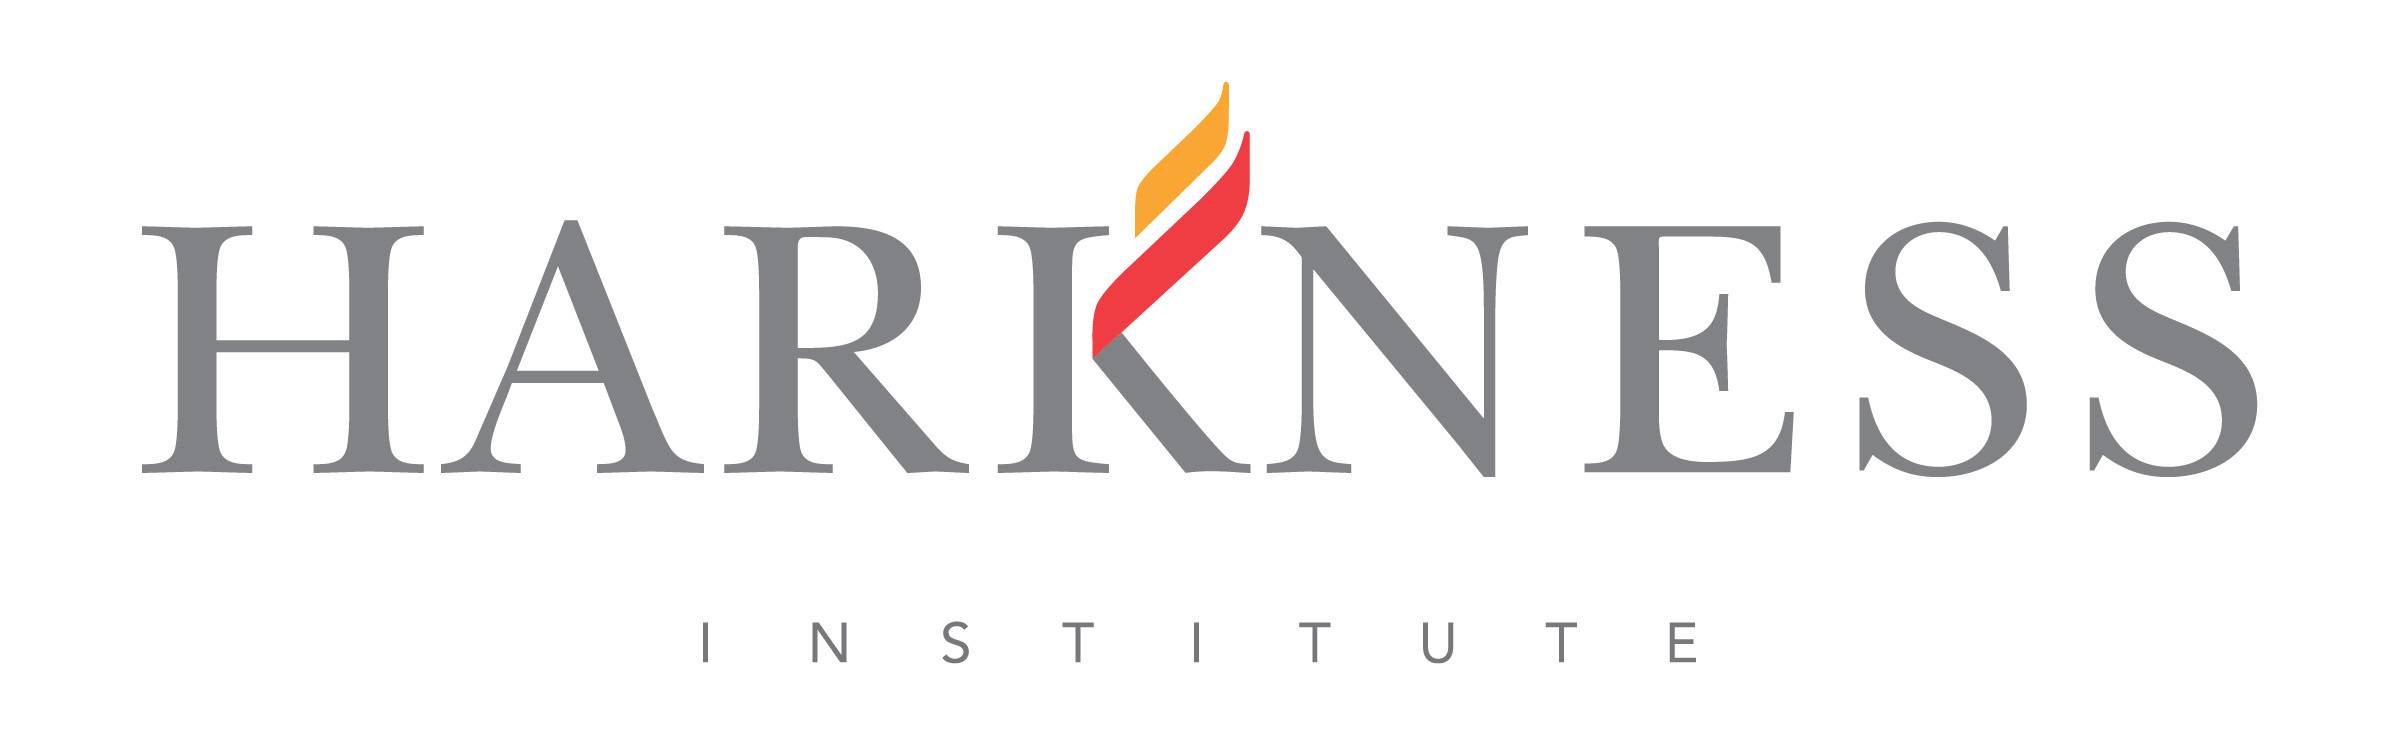 Logo of Harkness Institute